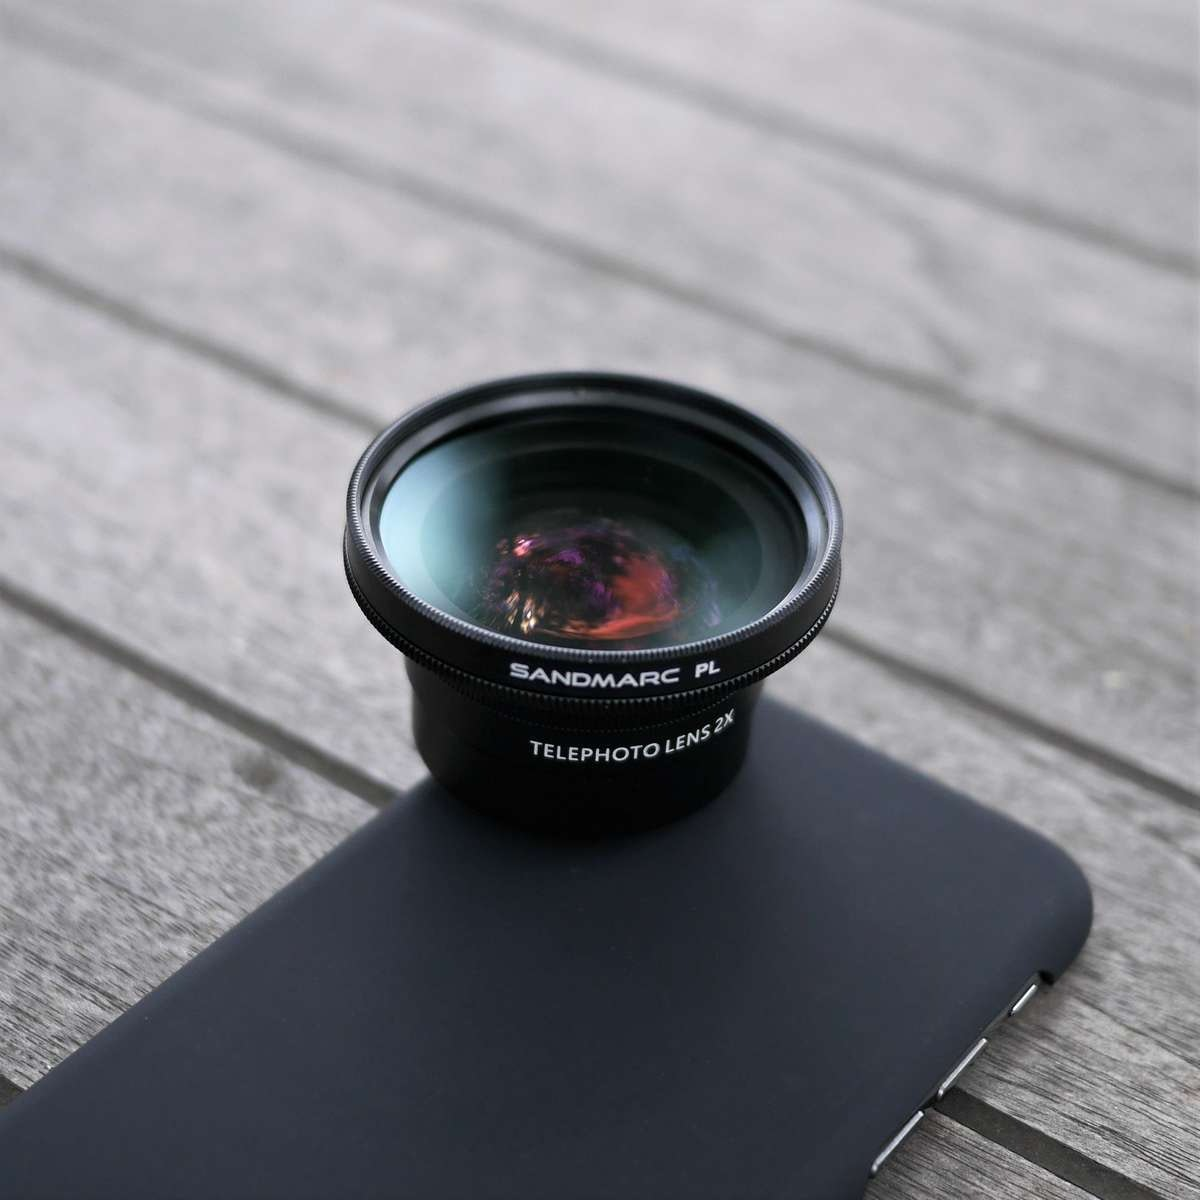 SANDMARC Lenses for iPhone XS Max - Capture next-level content